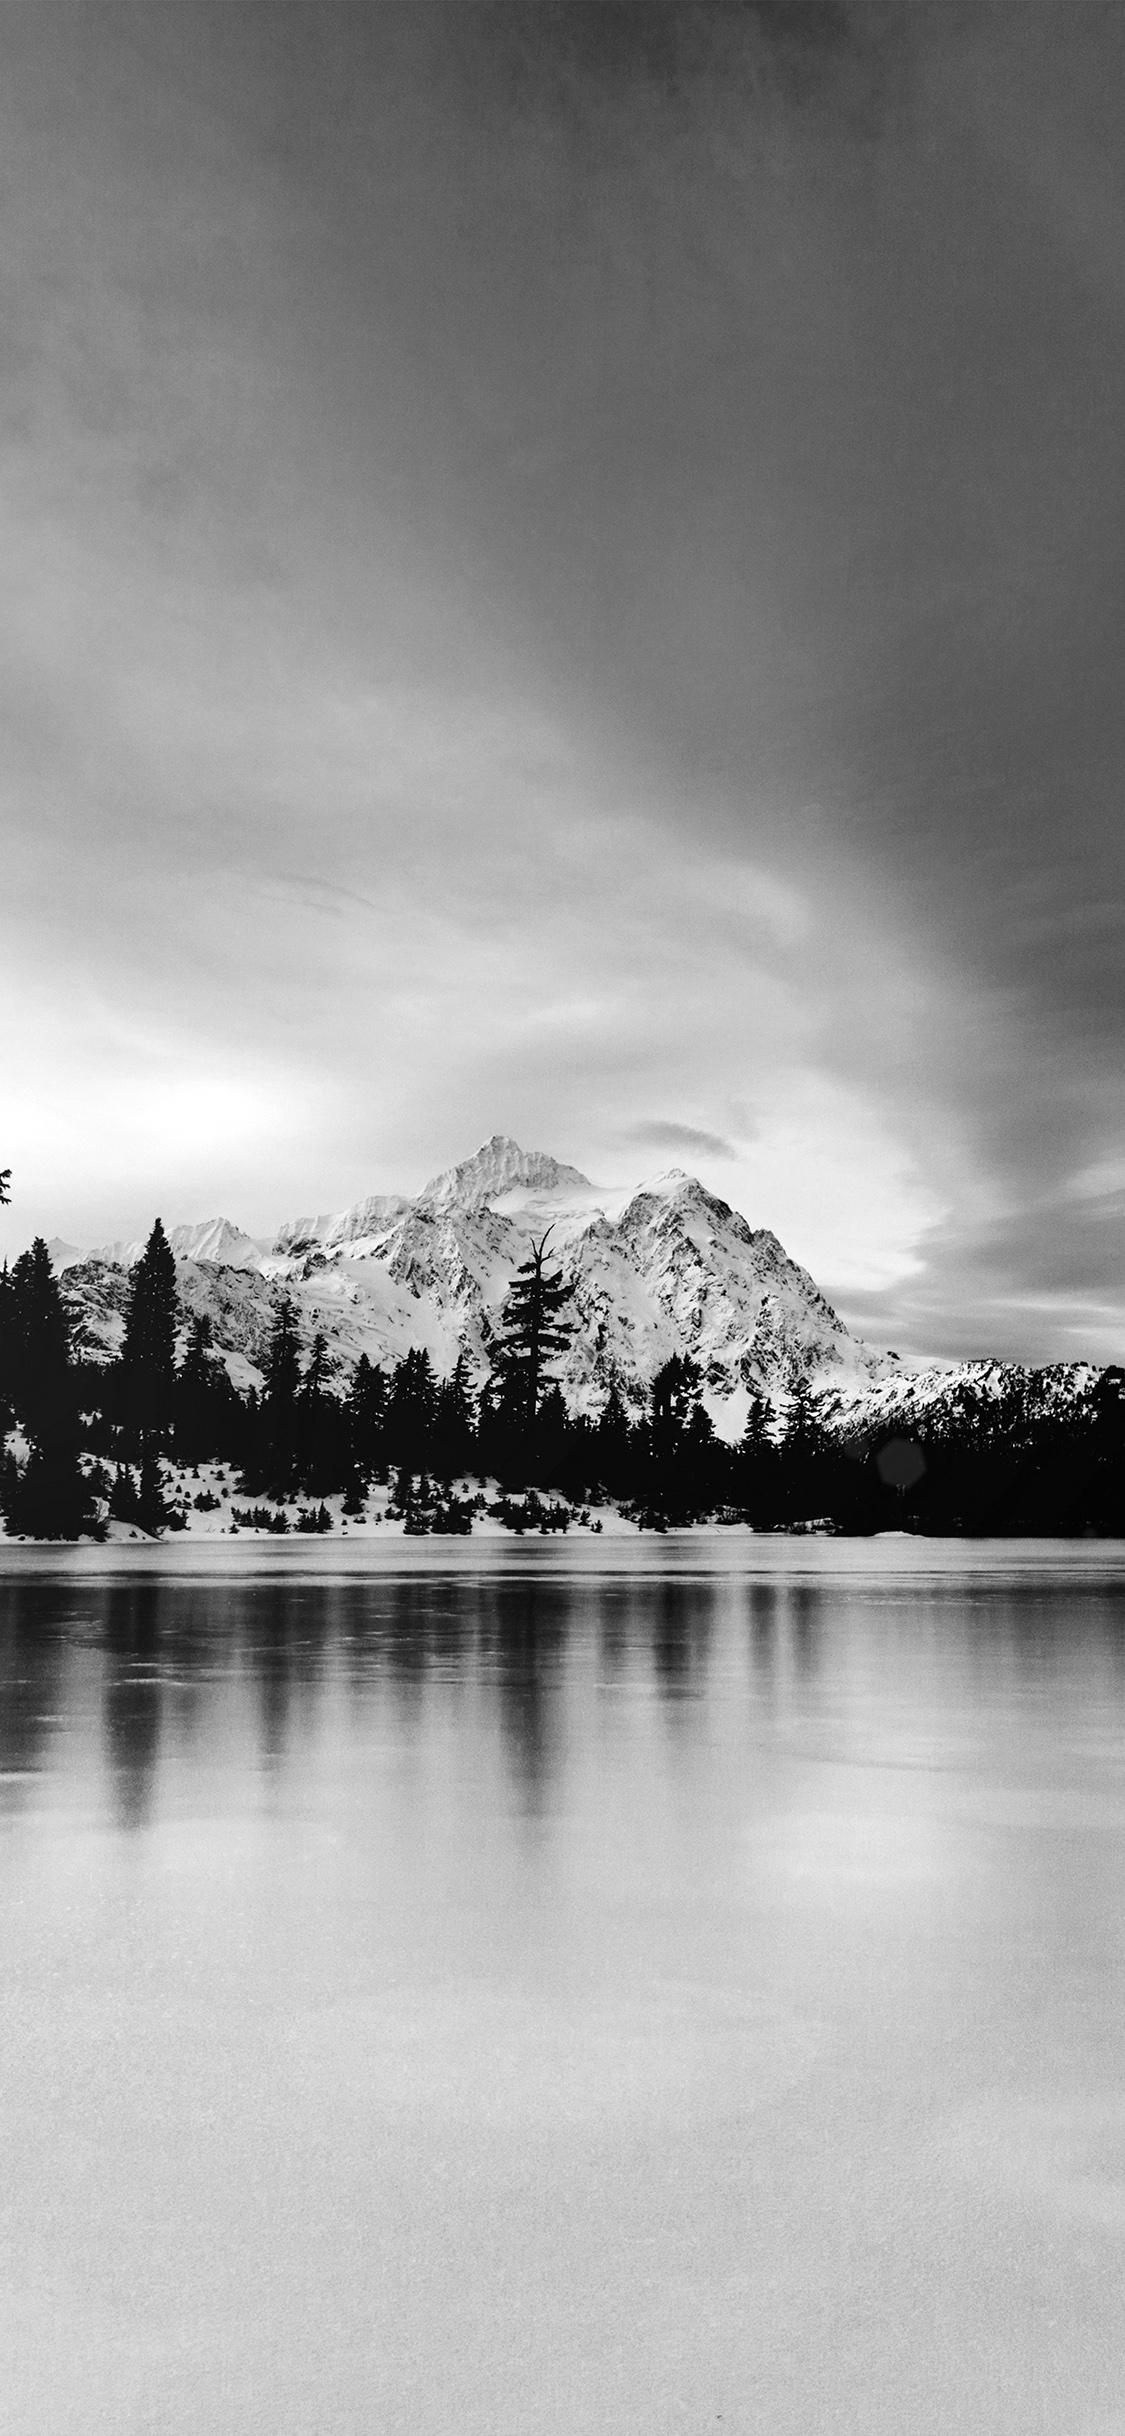 ni39-frozen-lake-winter-snow-wood-forest-cold-bw-dark ...